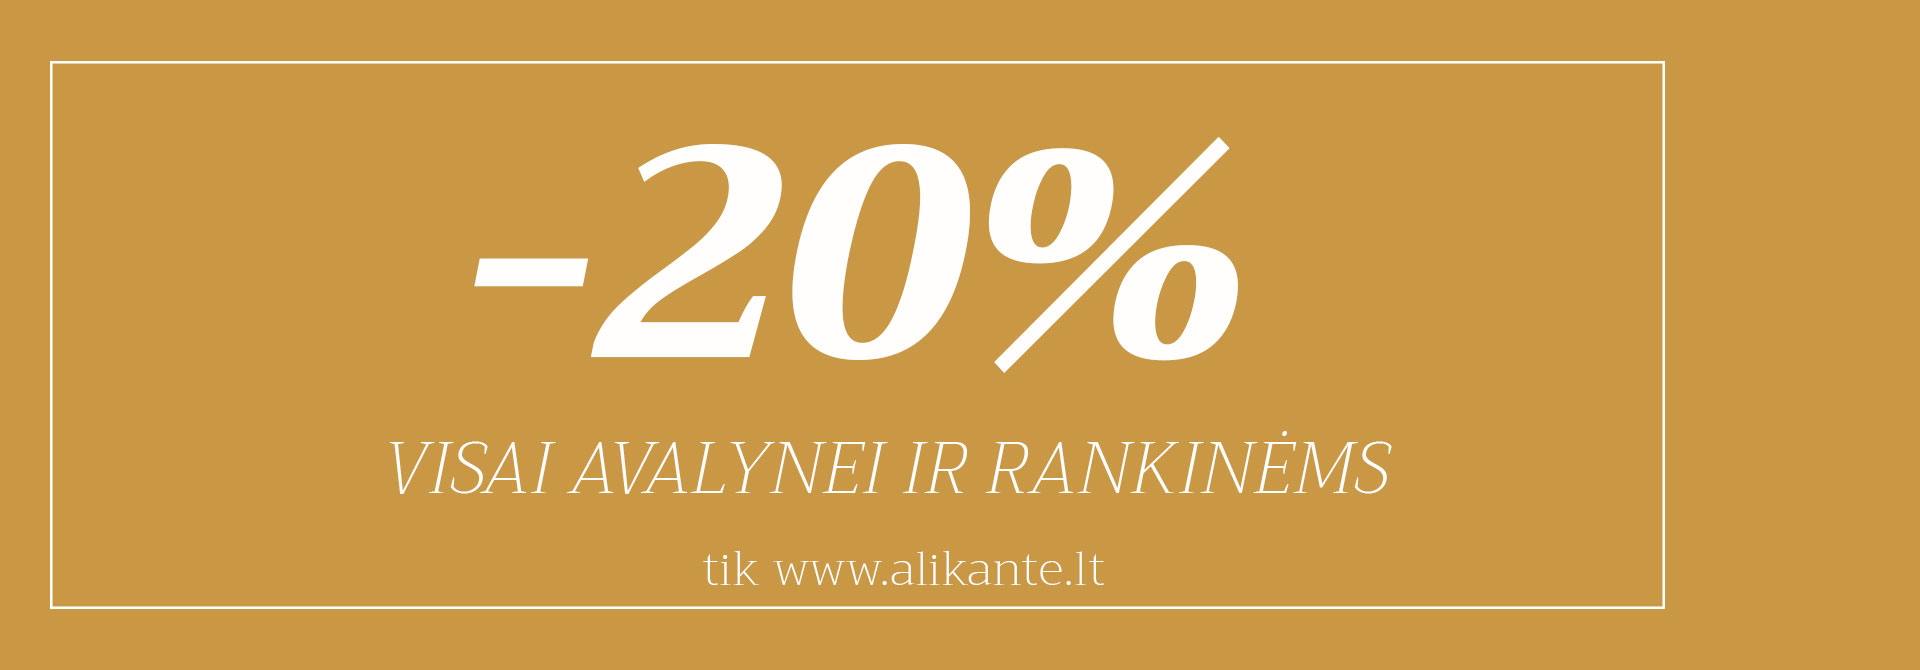 https://www.alikante.lt/nauja-kolekcija